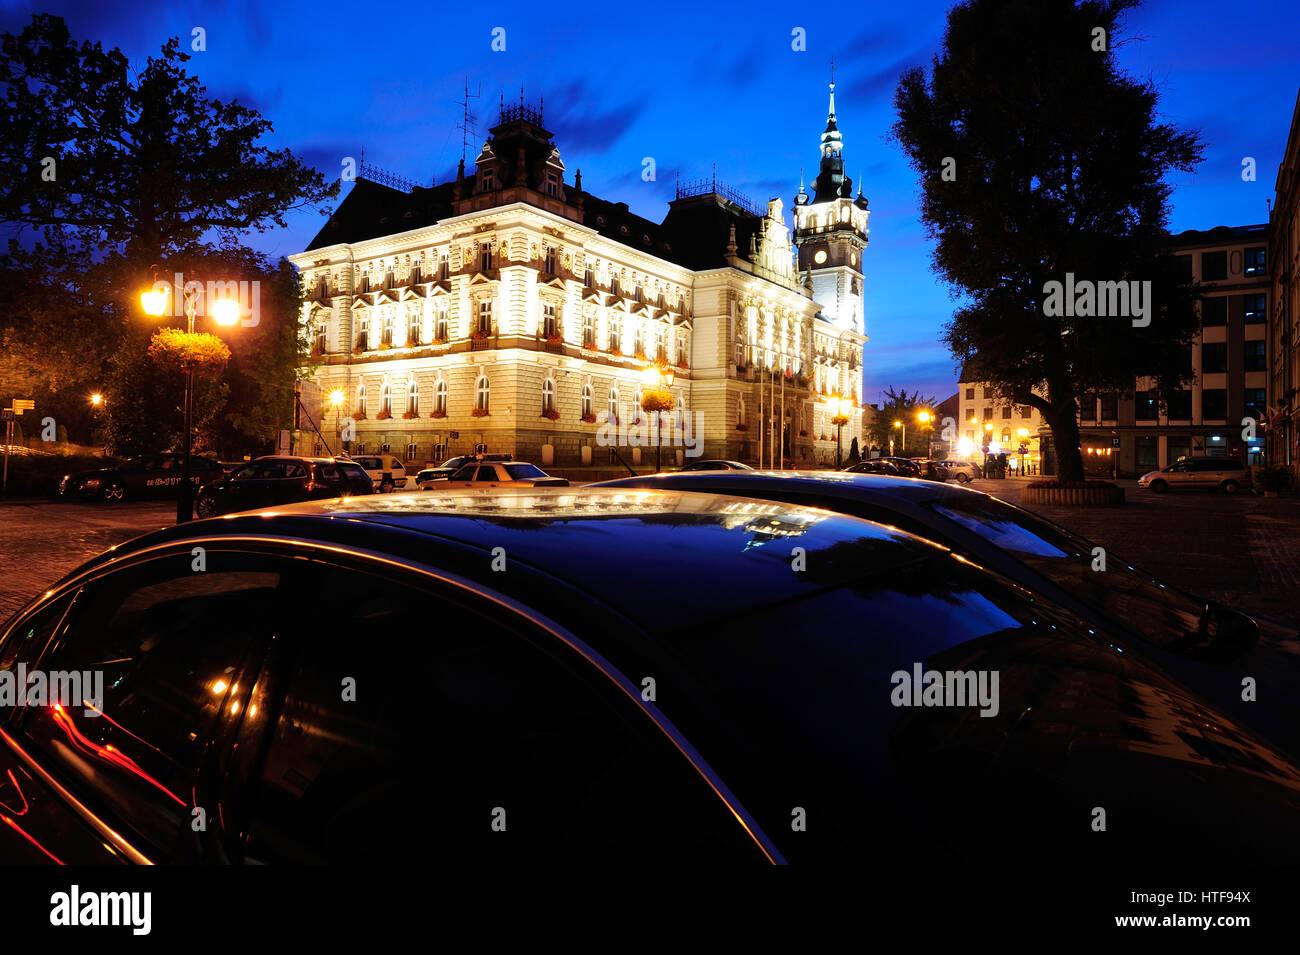 architecture, bielsko-biala, city, cityscape, clock, downtown, europe, evening, hall, illuminated, landmark, night, - Stock Image